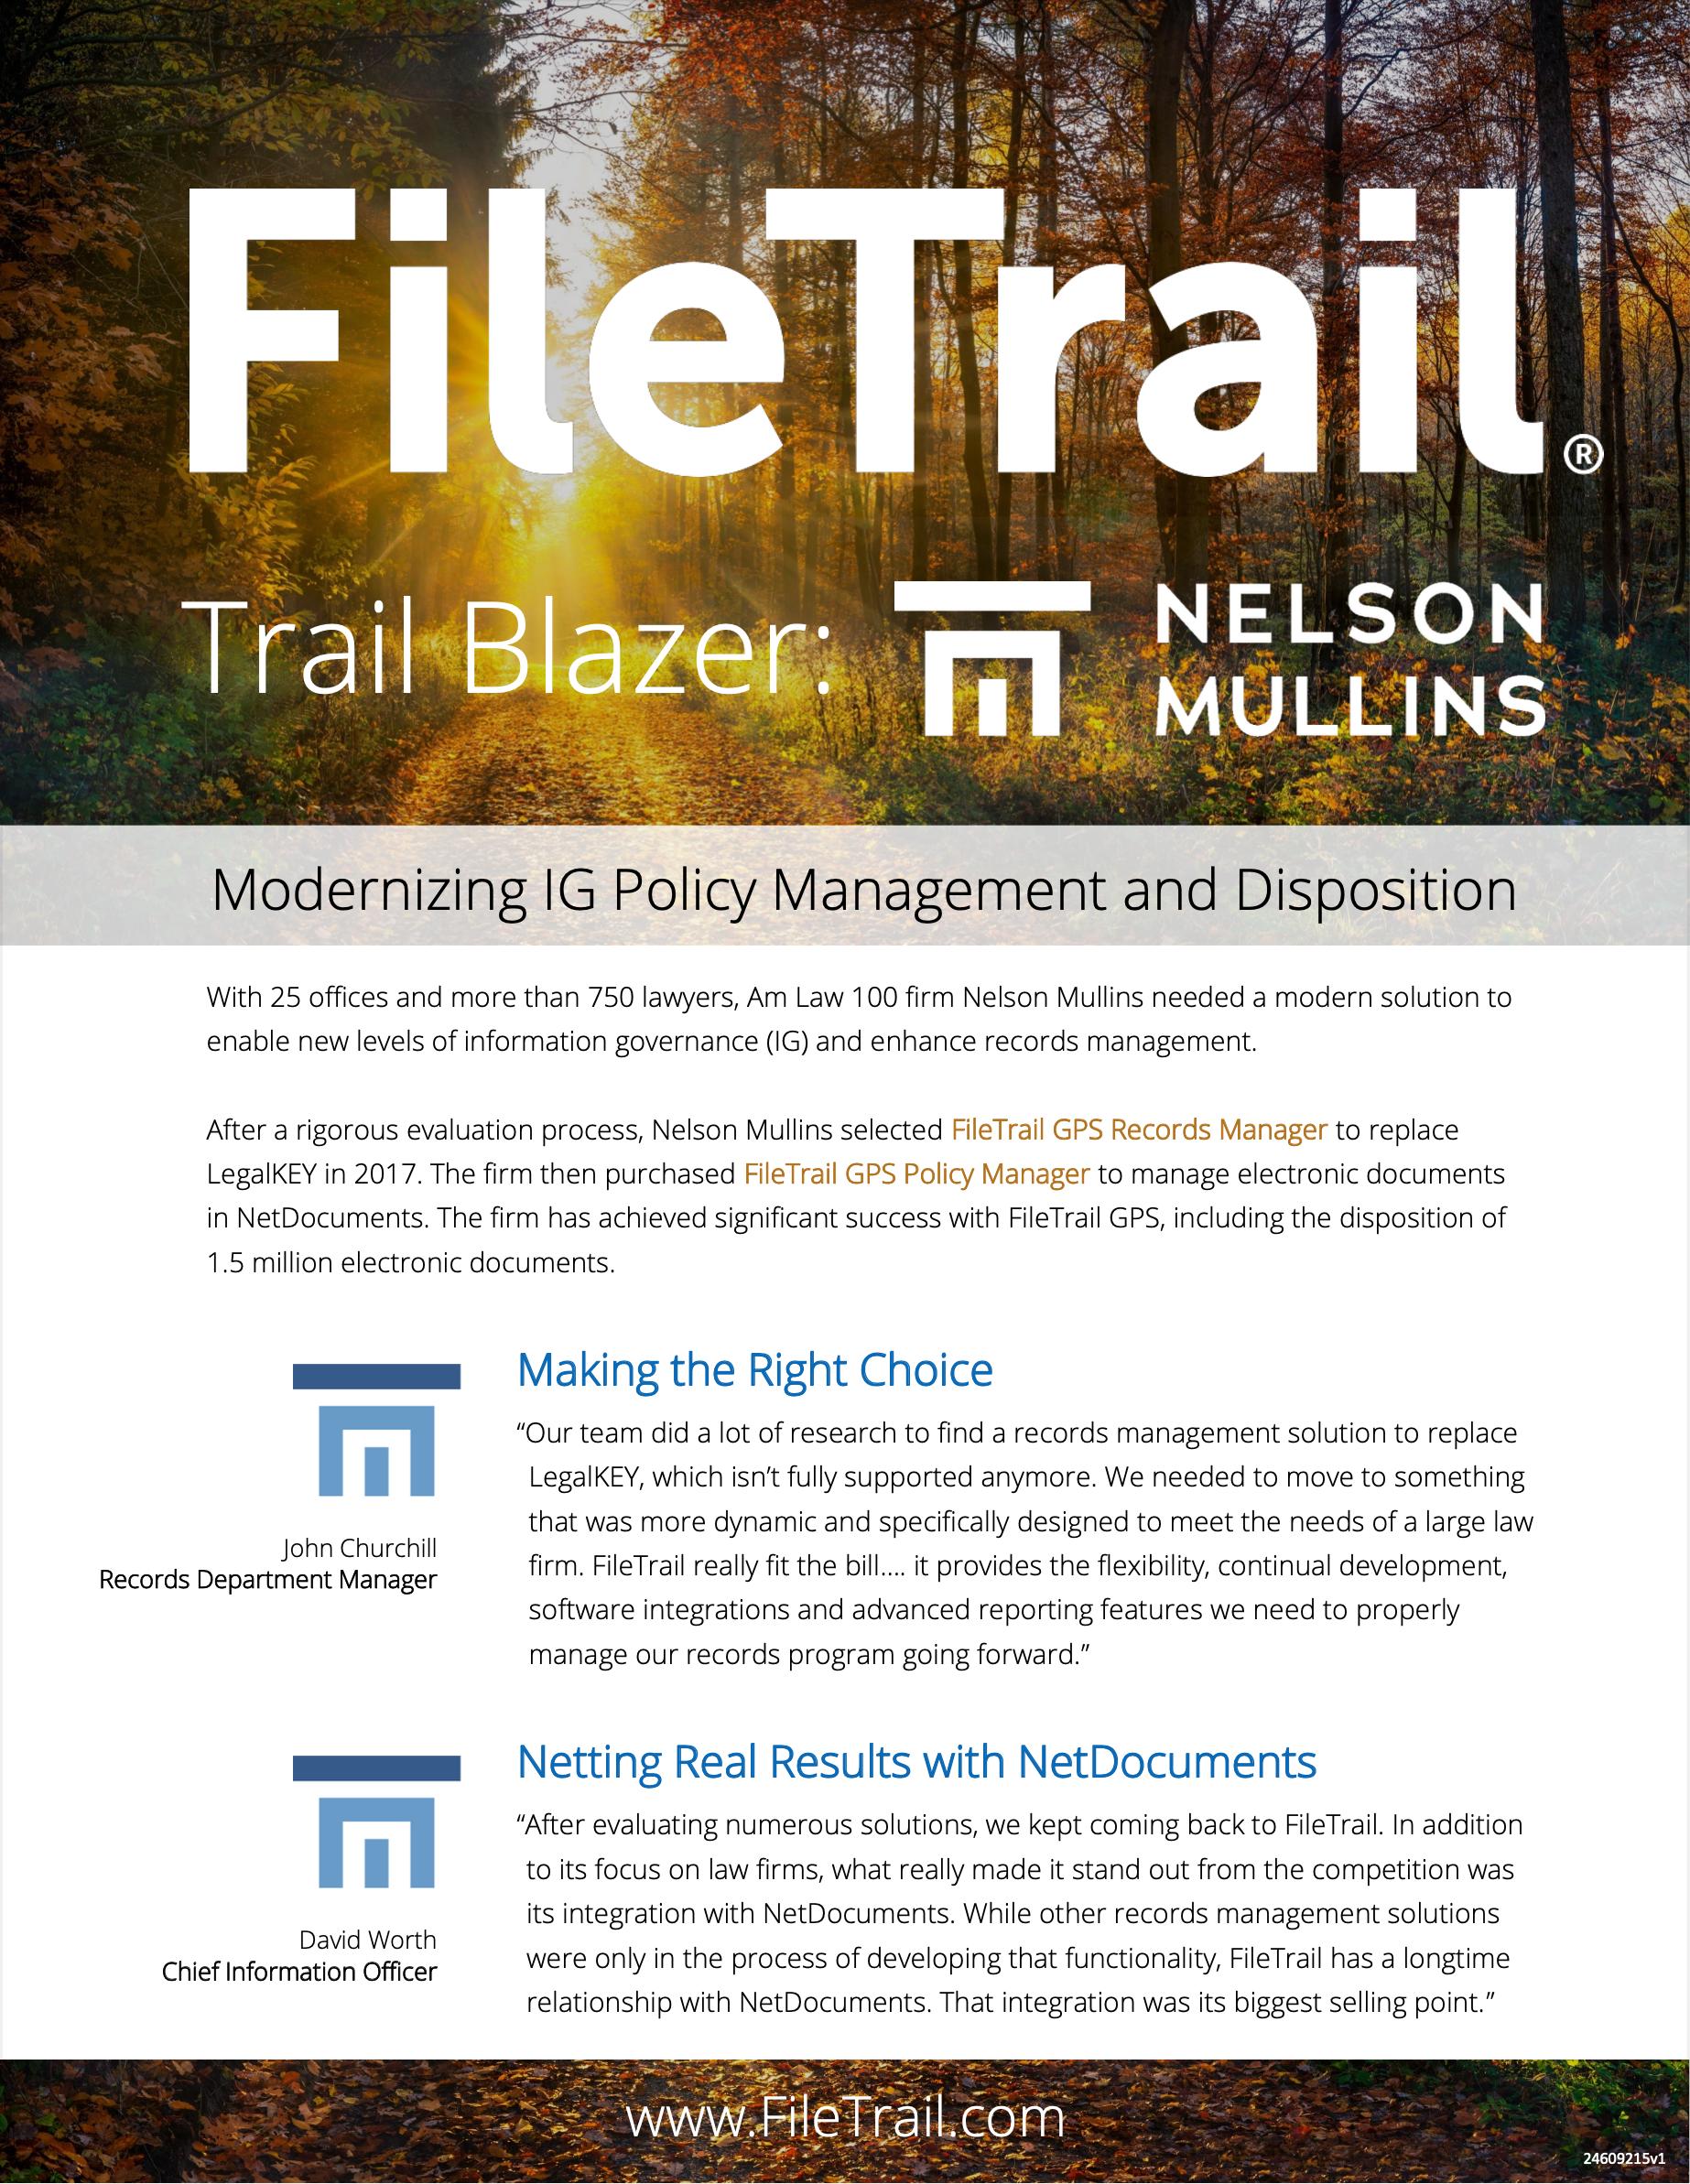 Nelson Mullins REcords Management Case Study